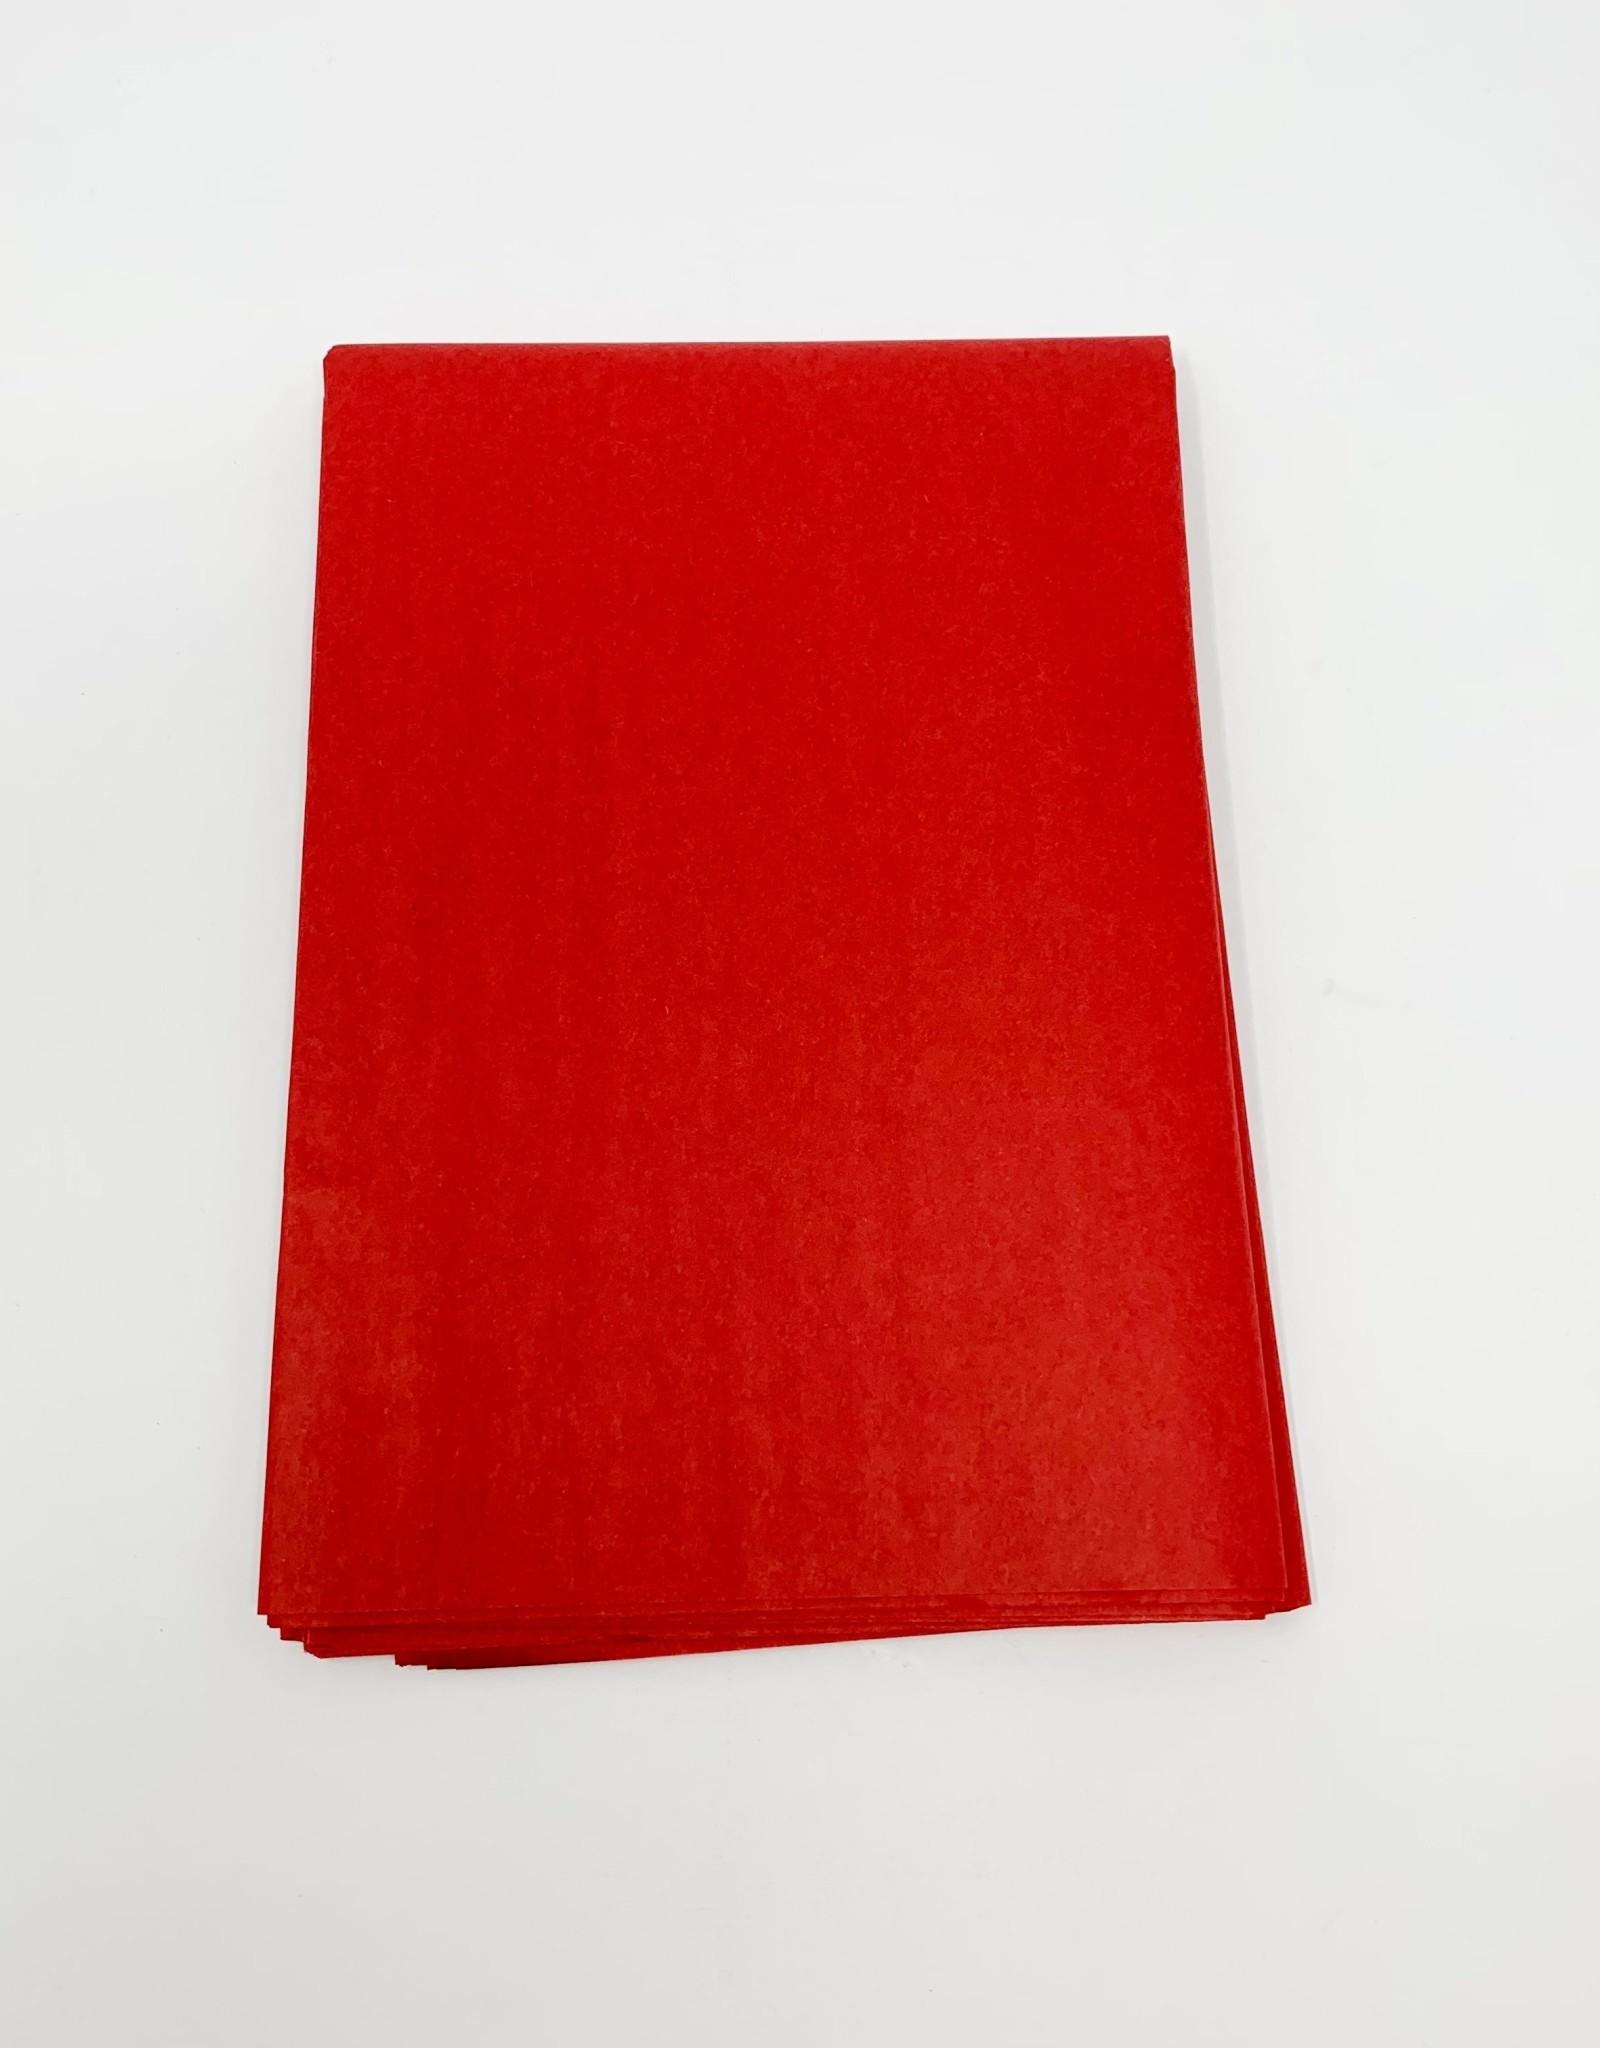 Misc. Red Tissue